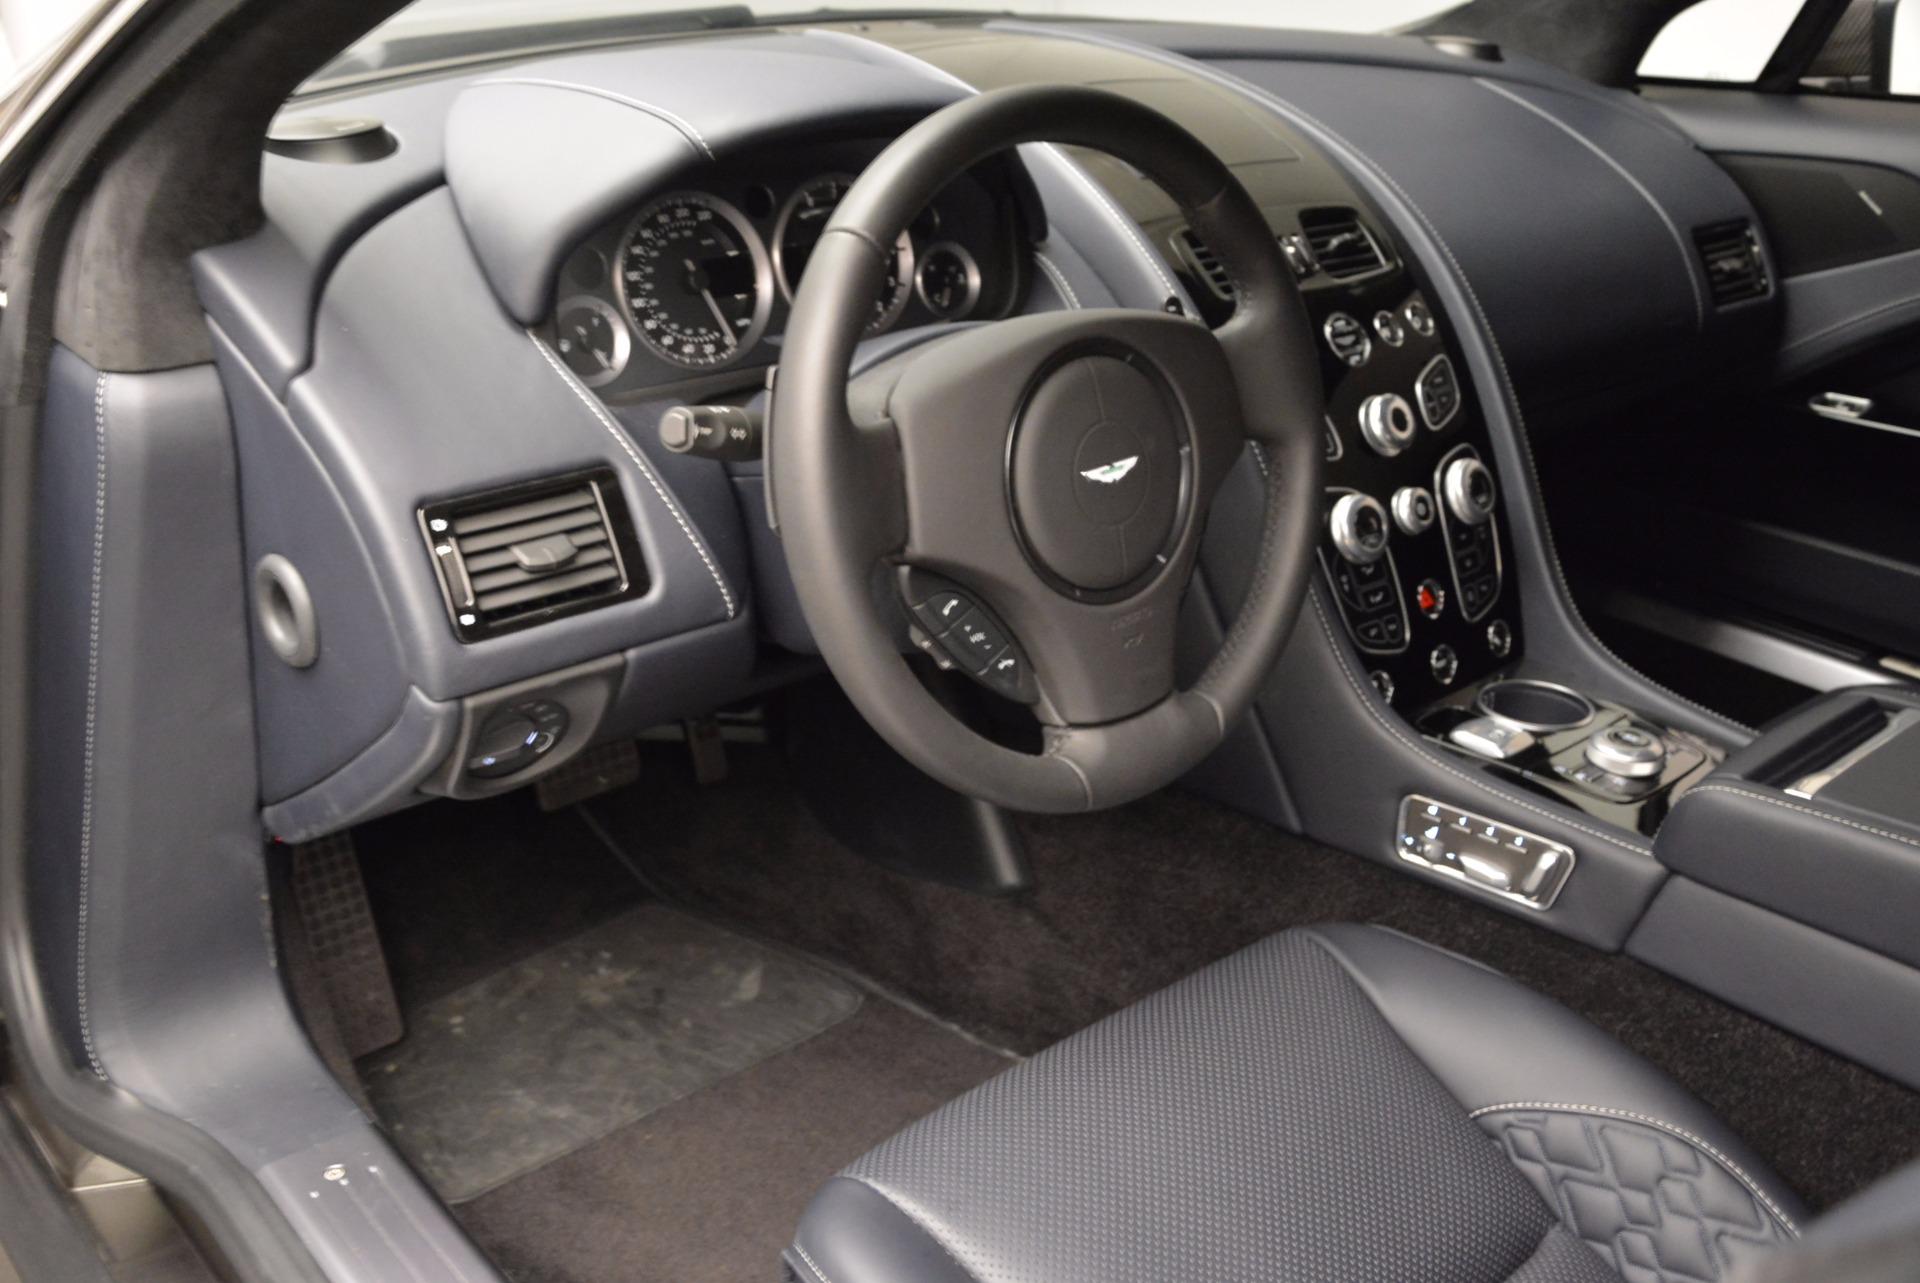 Used 2017 Aston Martin Rapide S Sedan For Sale In Greenwich, CT 1843_p14